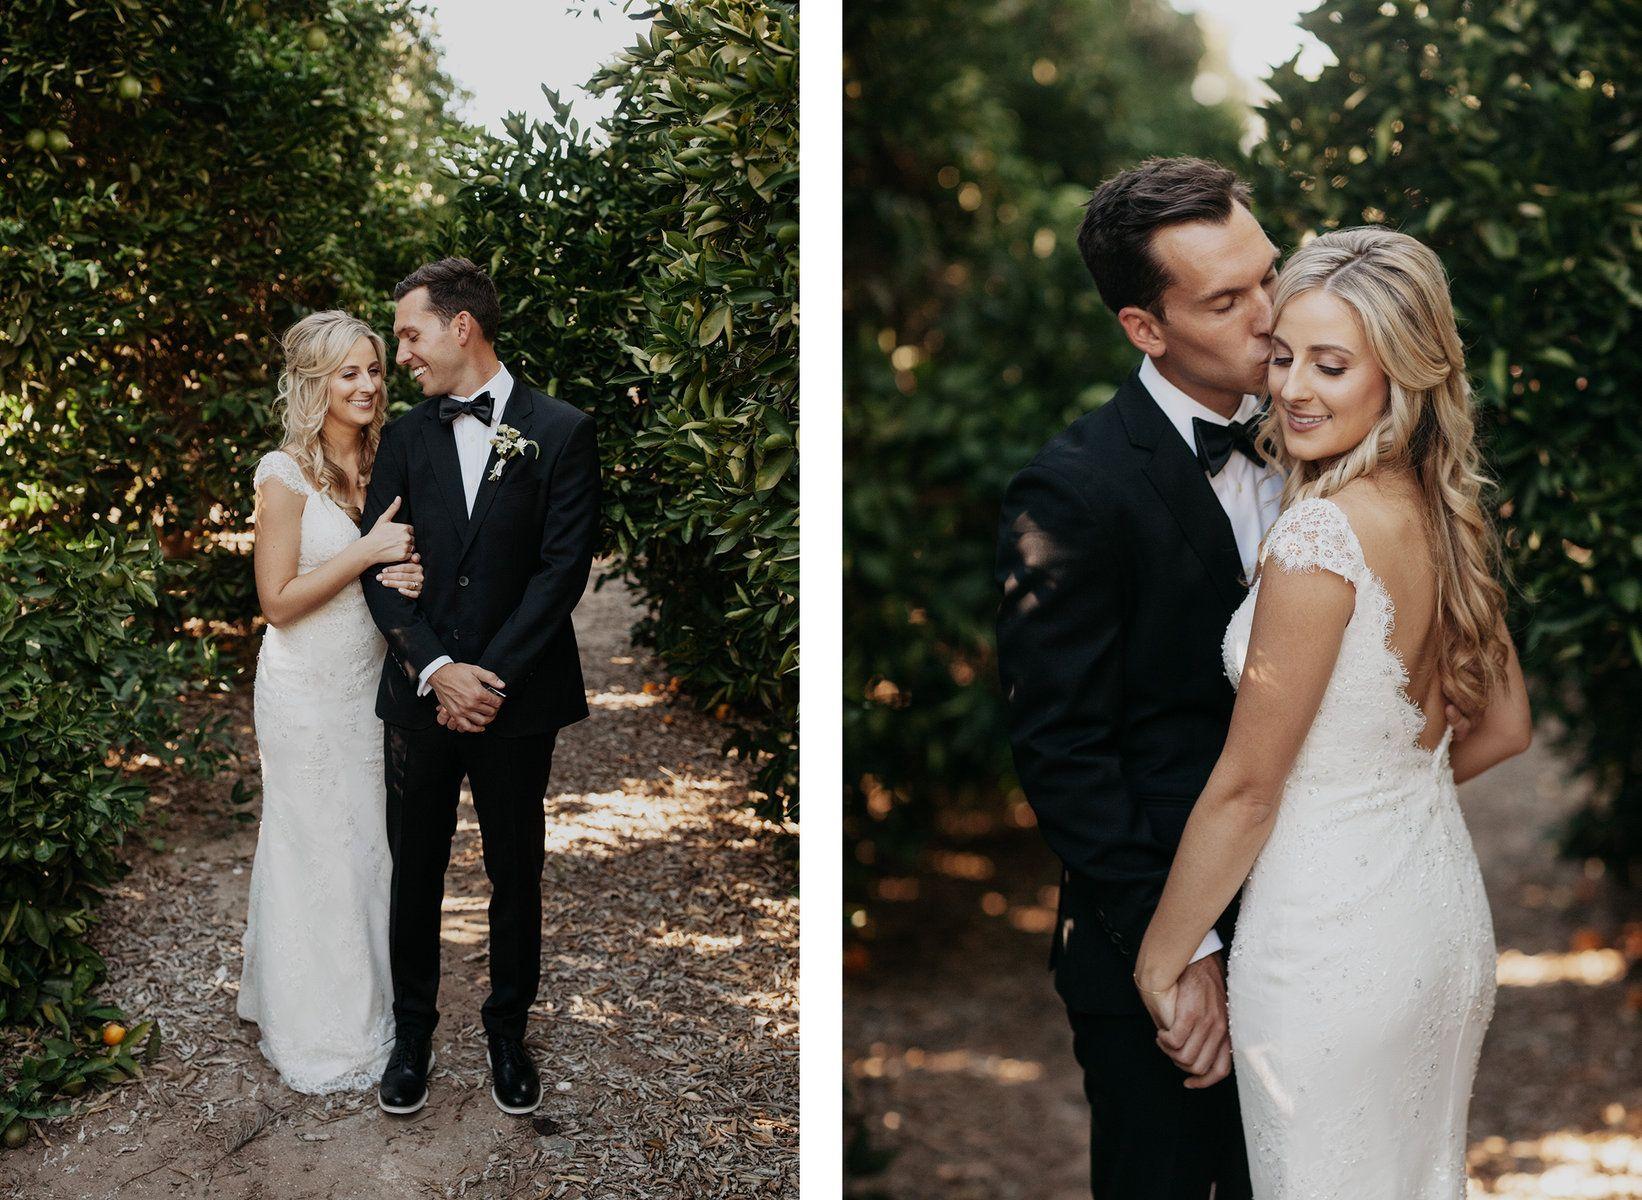 Courtney + Justin (Riverside, CA) - Jordan Voth | Seattle Wedding ...